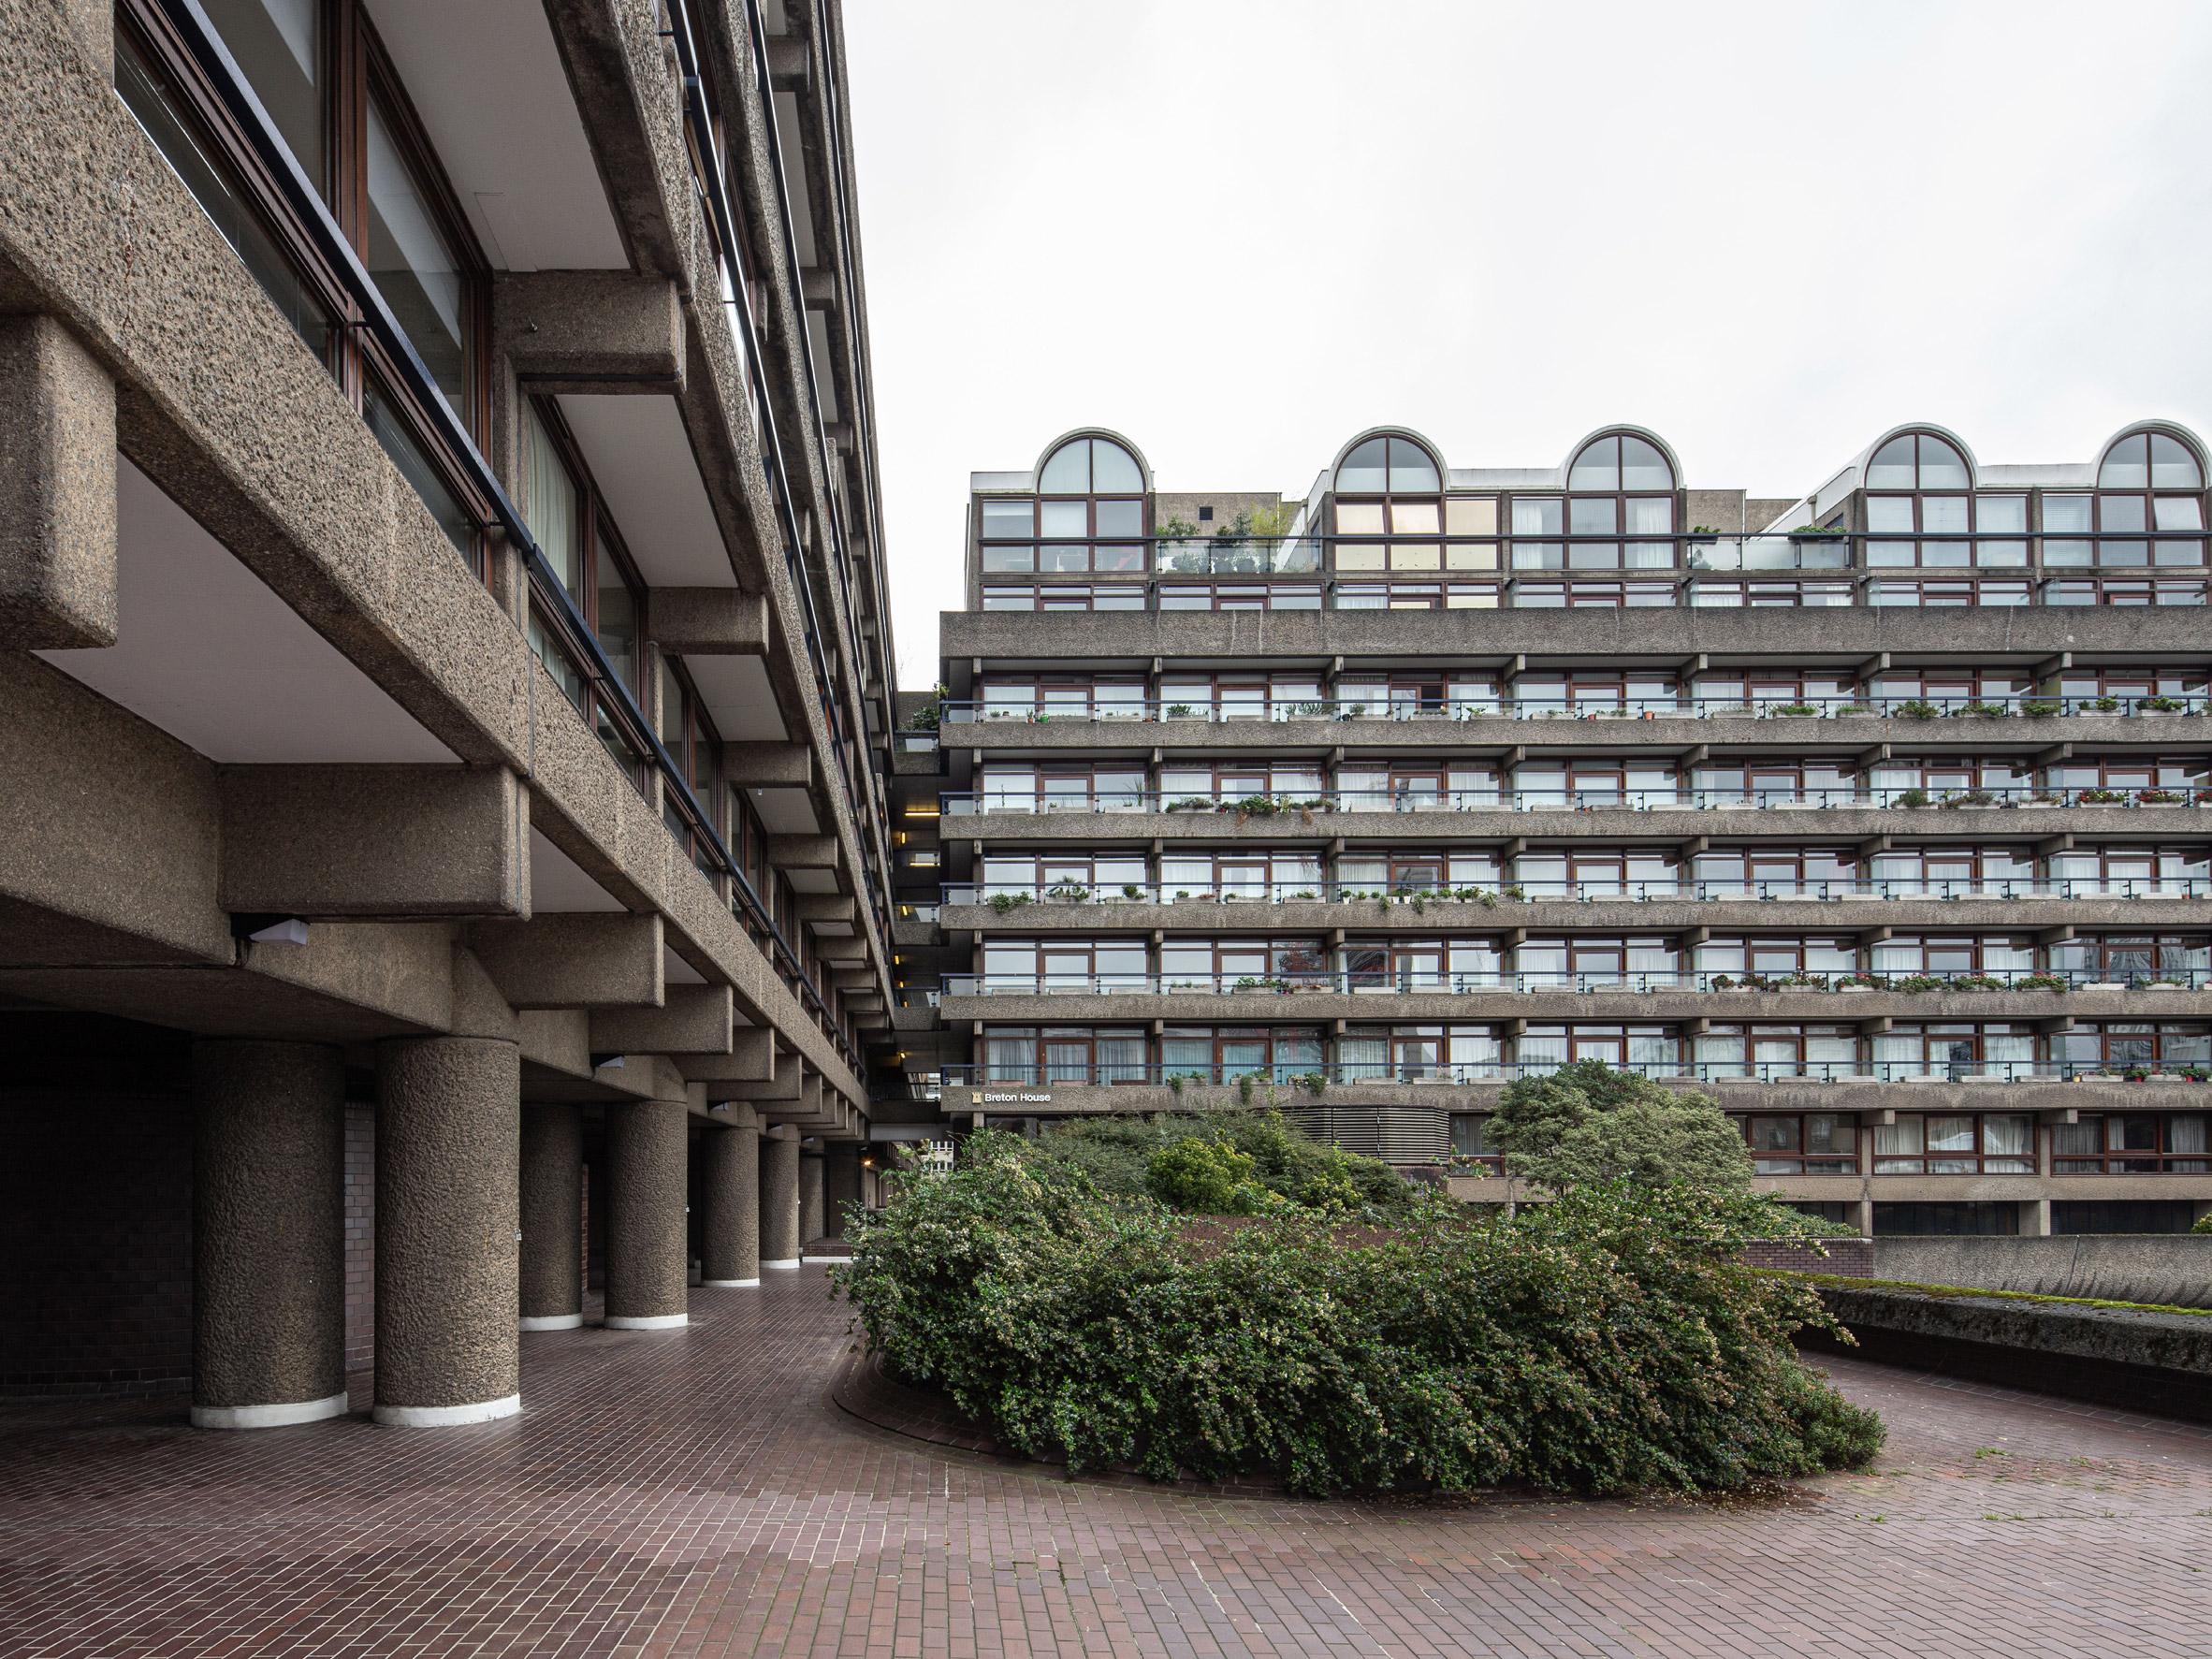 Exteriores de Barbican Estate / Handover / Intervention Architecture